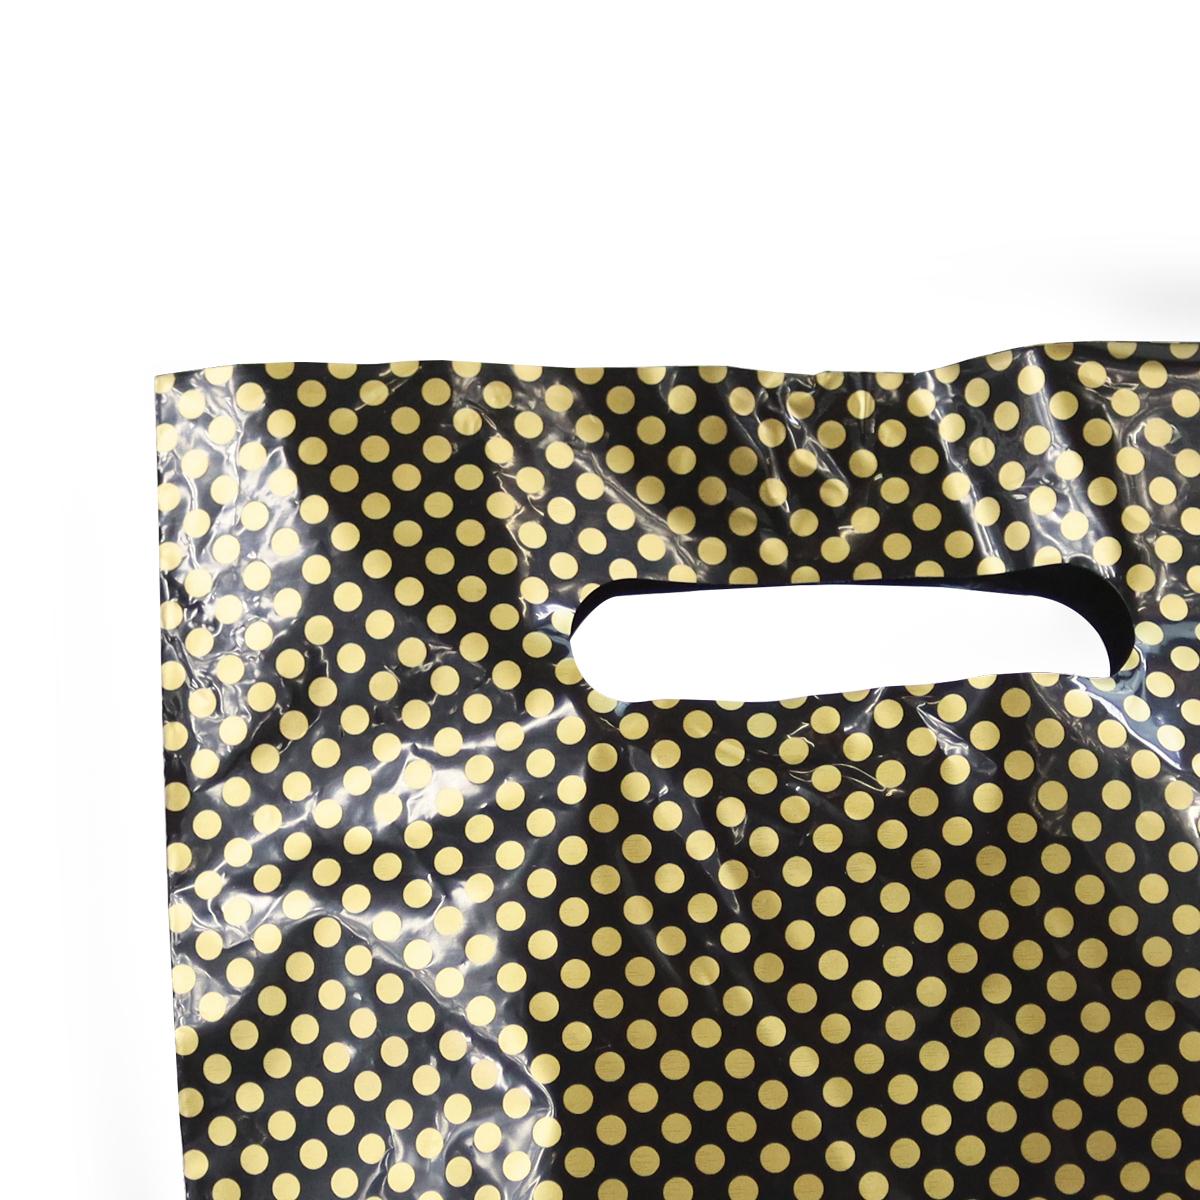 Budget plastic tassen - Zwart met gouden stipjes